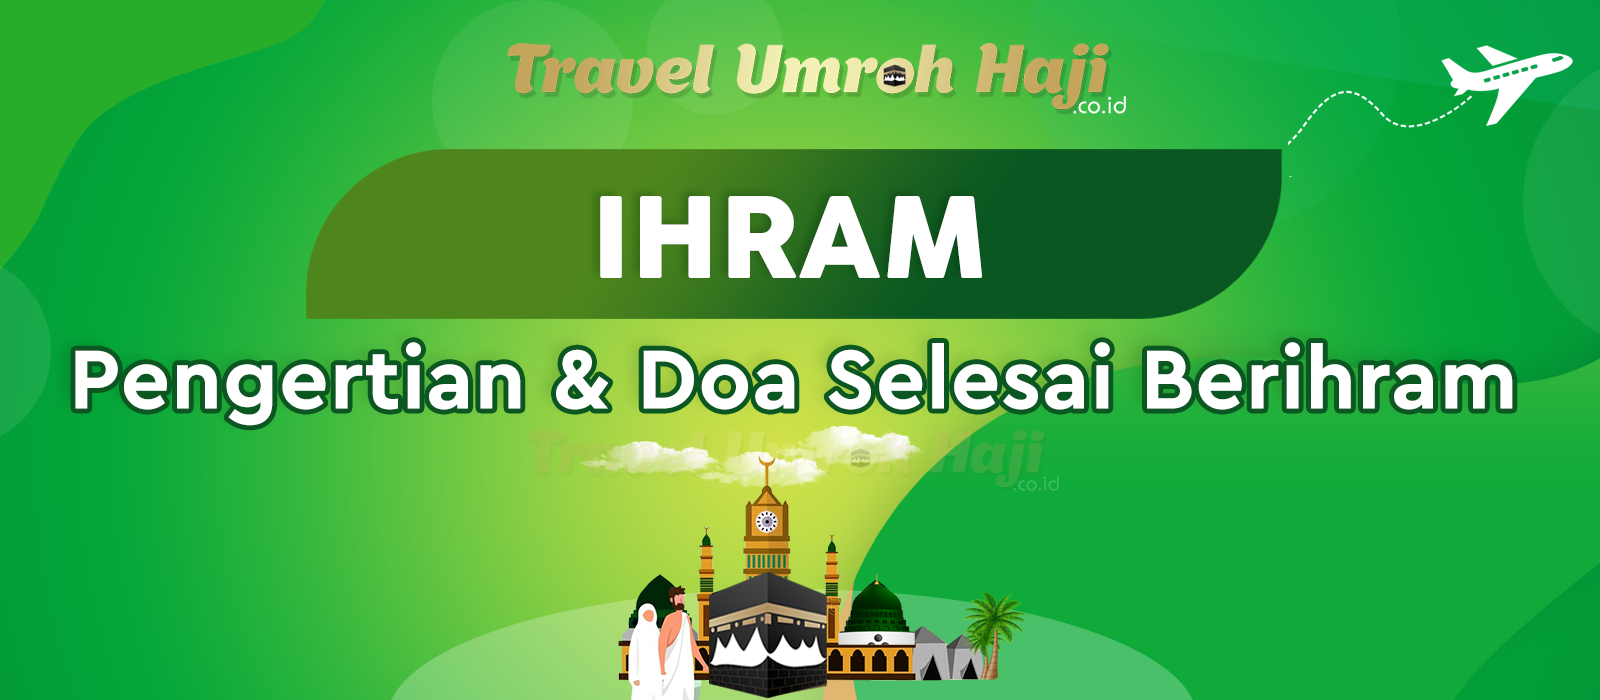 Doa Sesudah Selesai Berihram dan Apa yang dimaksud dengan Pengertian Ihram?